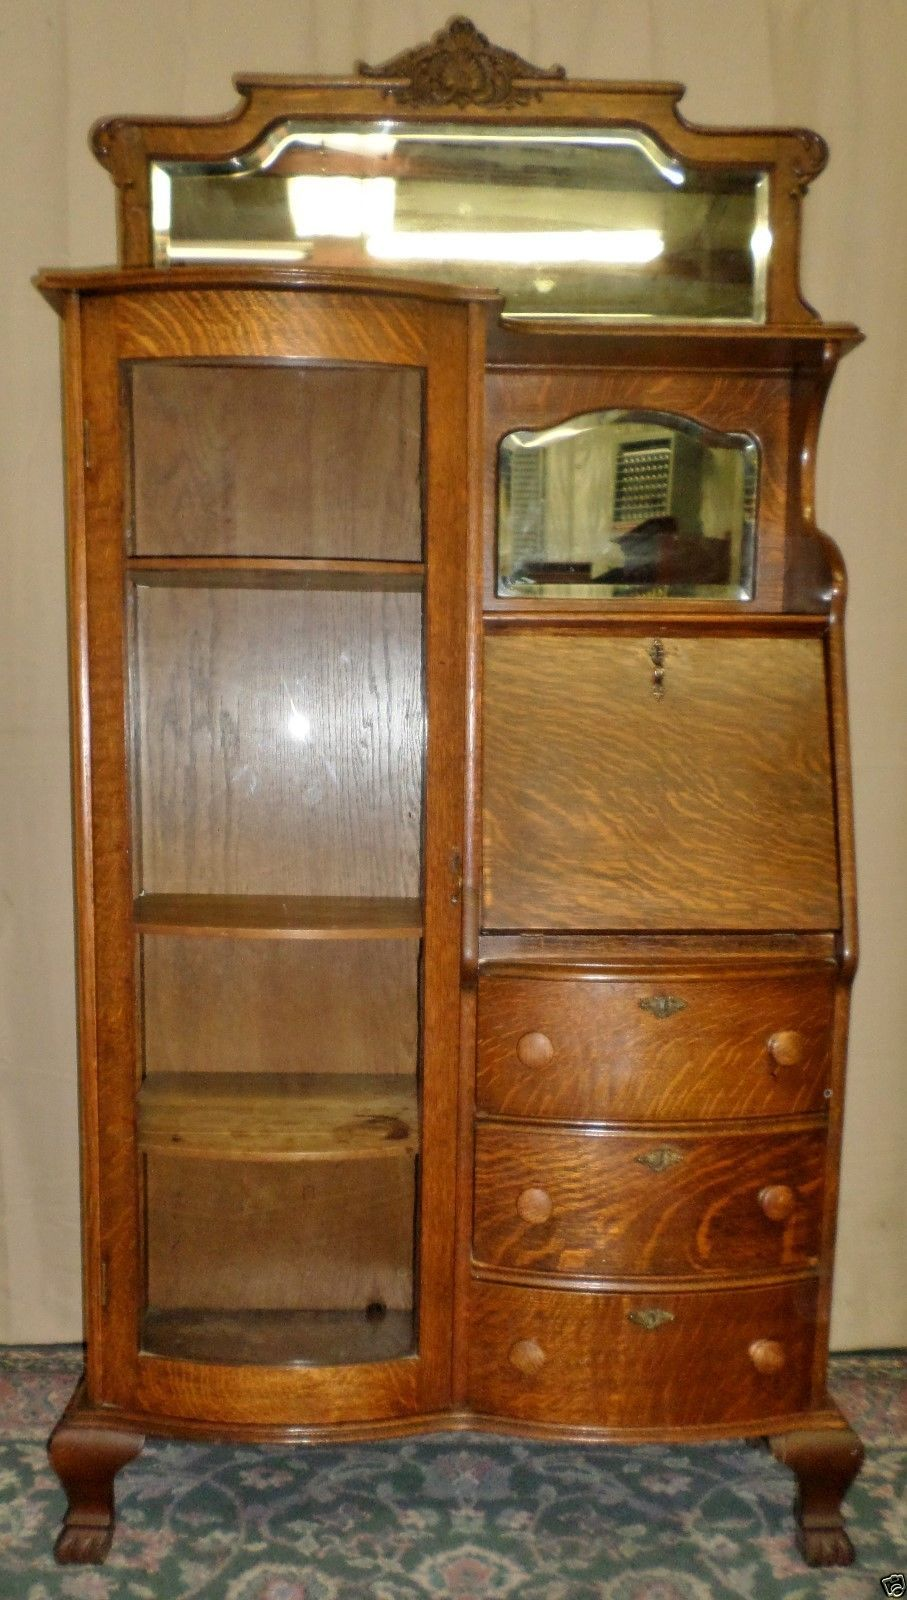 Medium Wood Tone Oak American Antique Furniture | eBay - TIGER OAK DESK SIDE BY SIDE Writing Desk Applied Carving Mirror